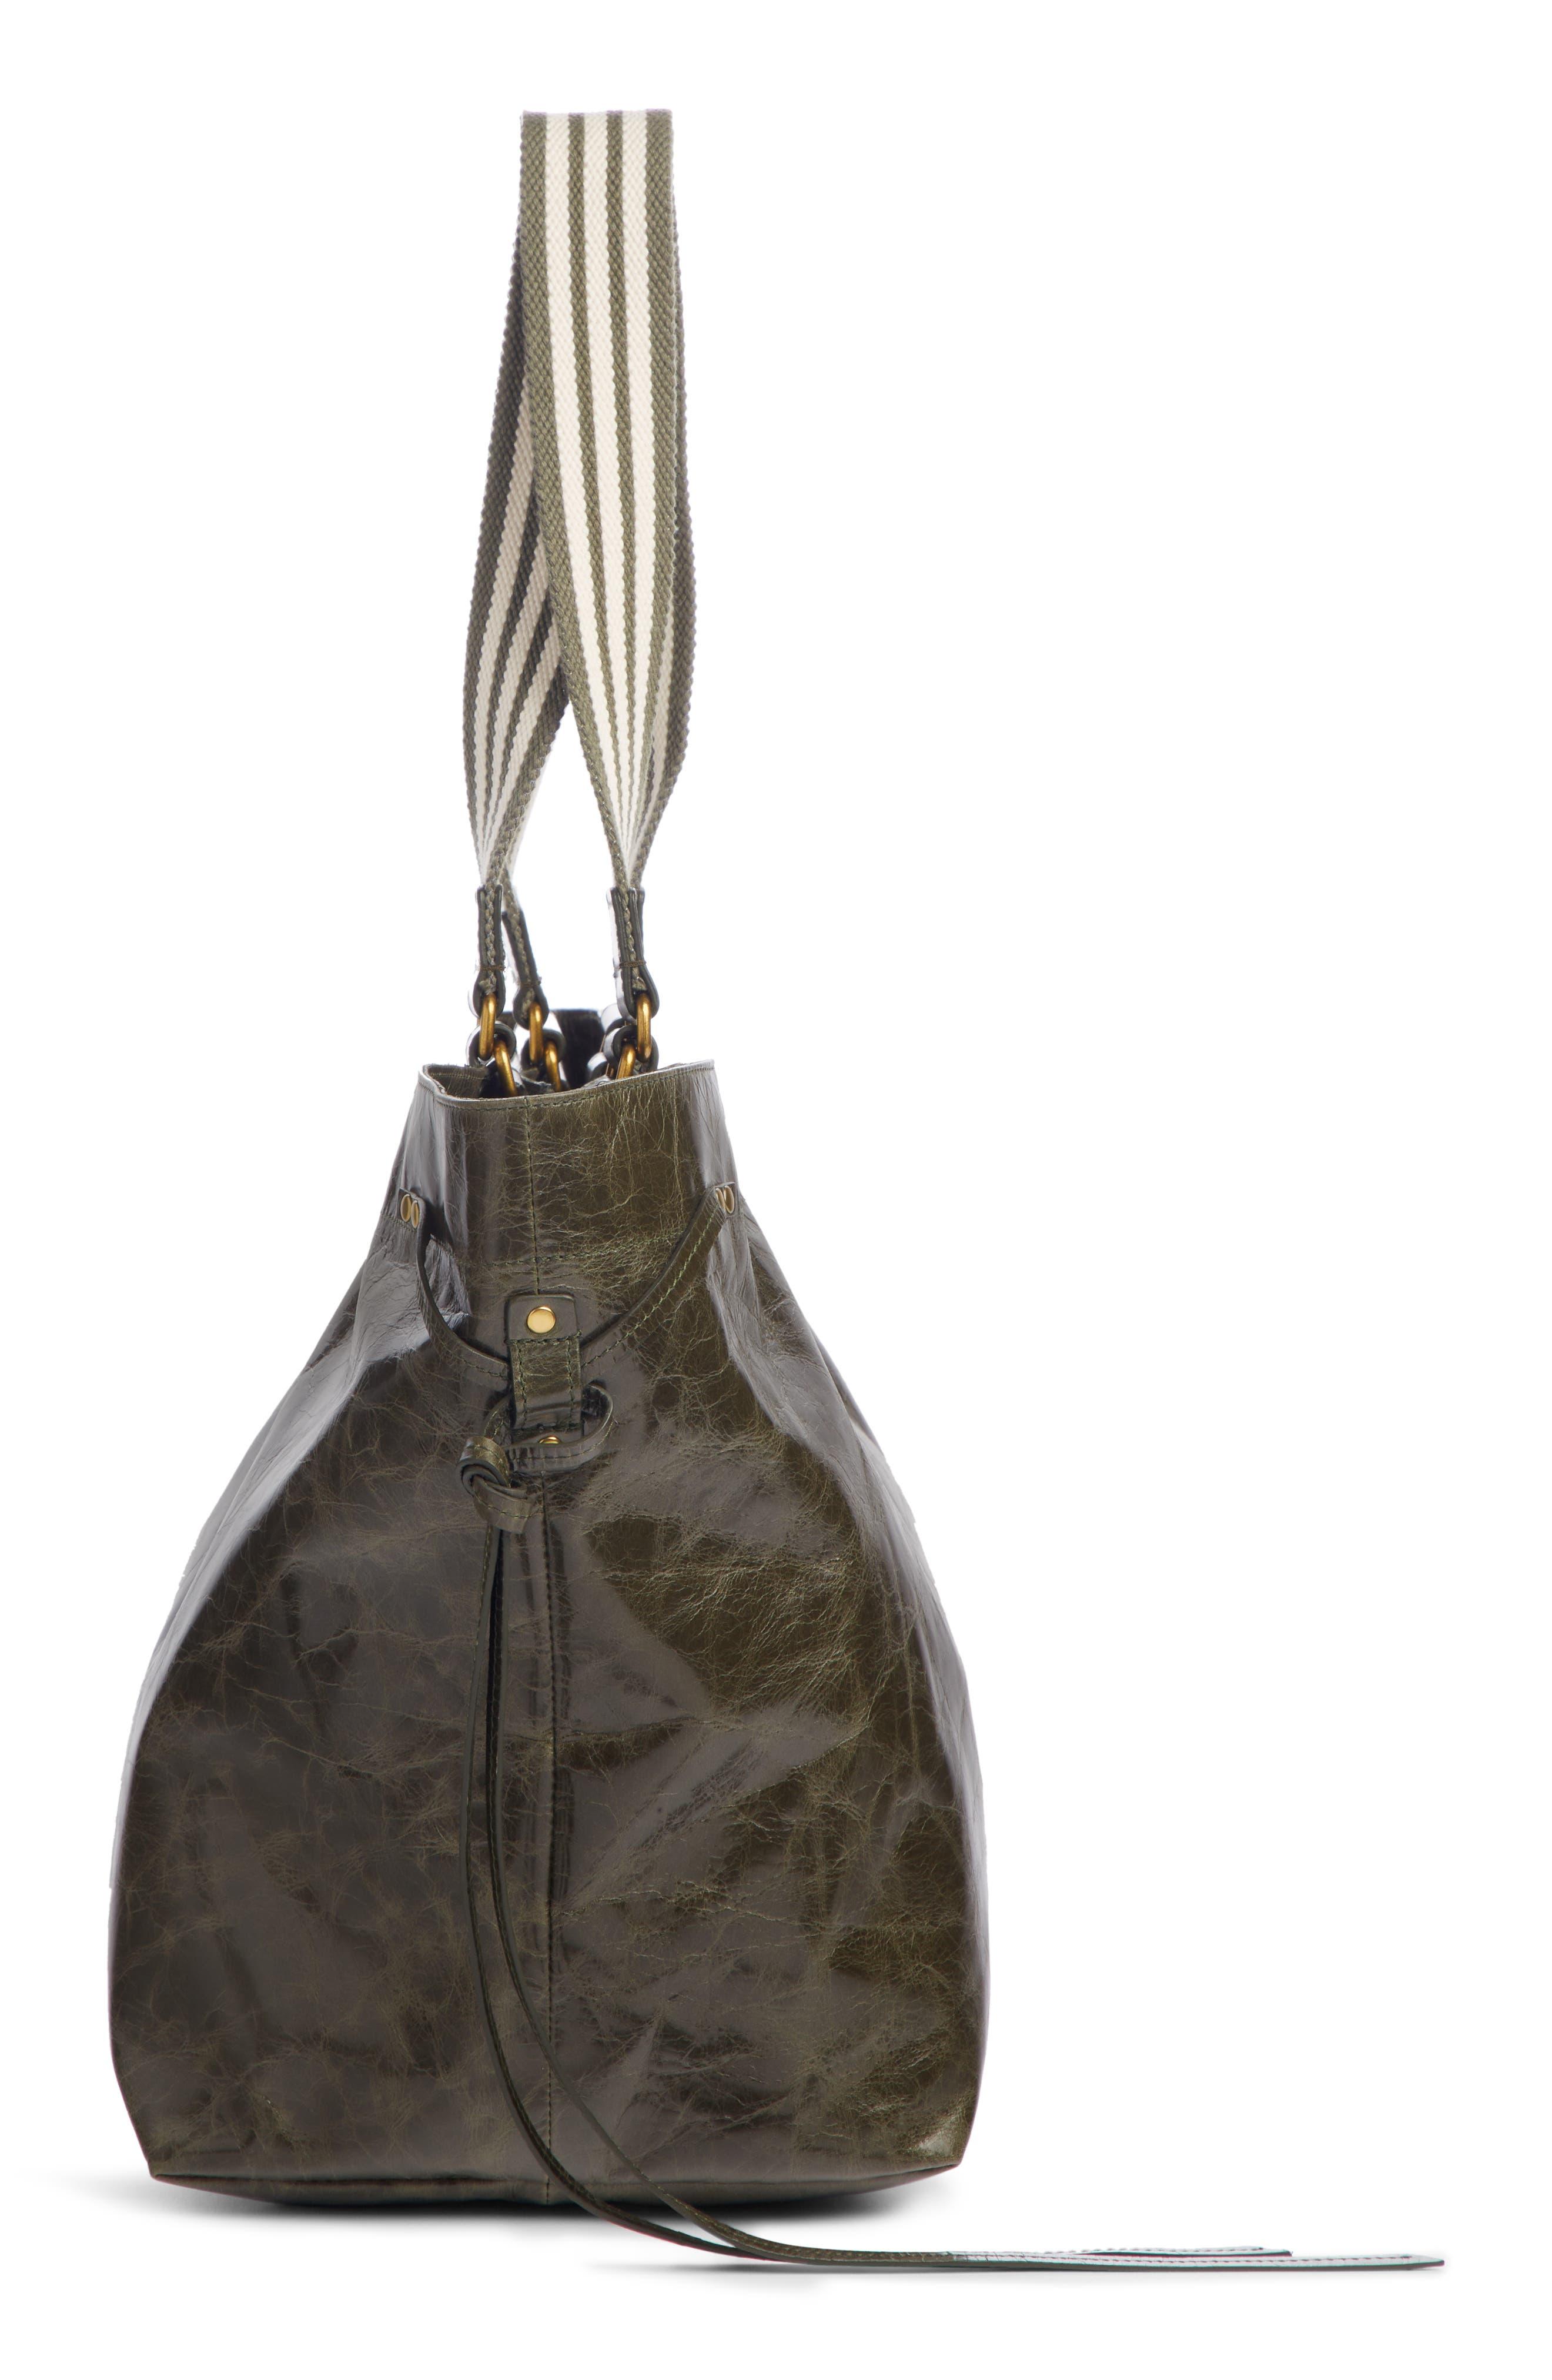 ISABEL MARANT,                             Wardy New Leather Shopper,                             Alternate thumbnail 4, color,                             KHAKI